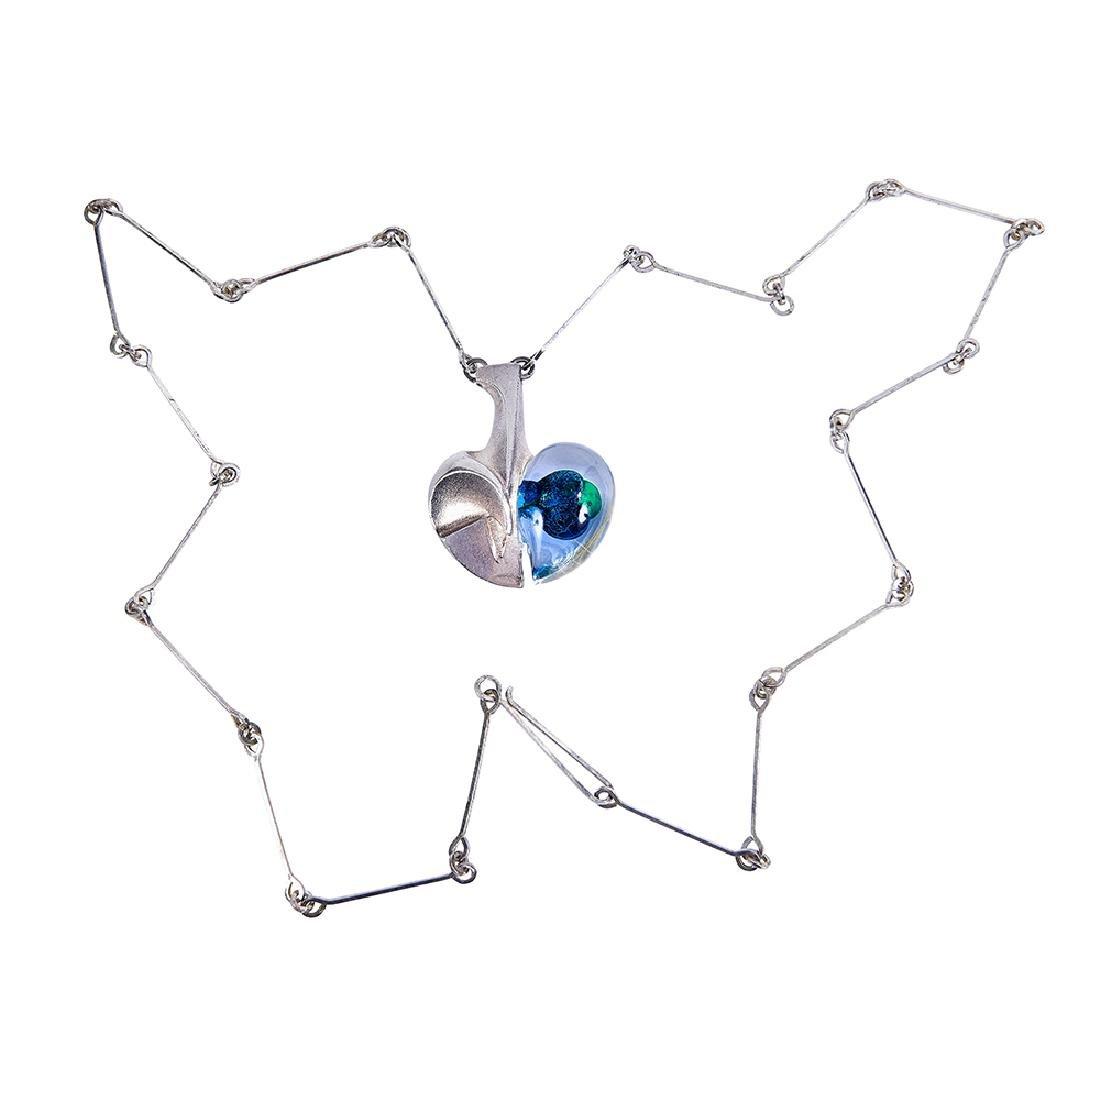 Björn Weckström for Lapponia necklace pendant - 3